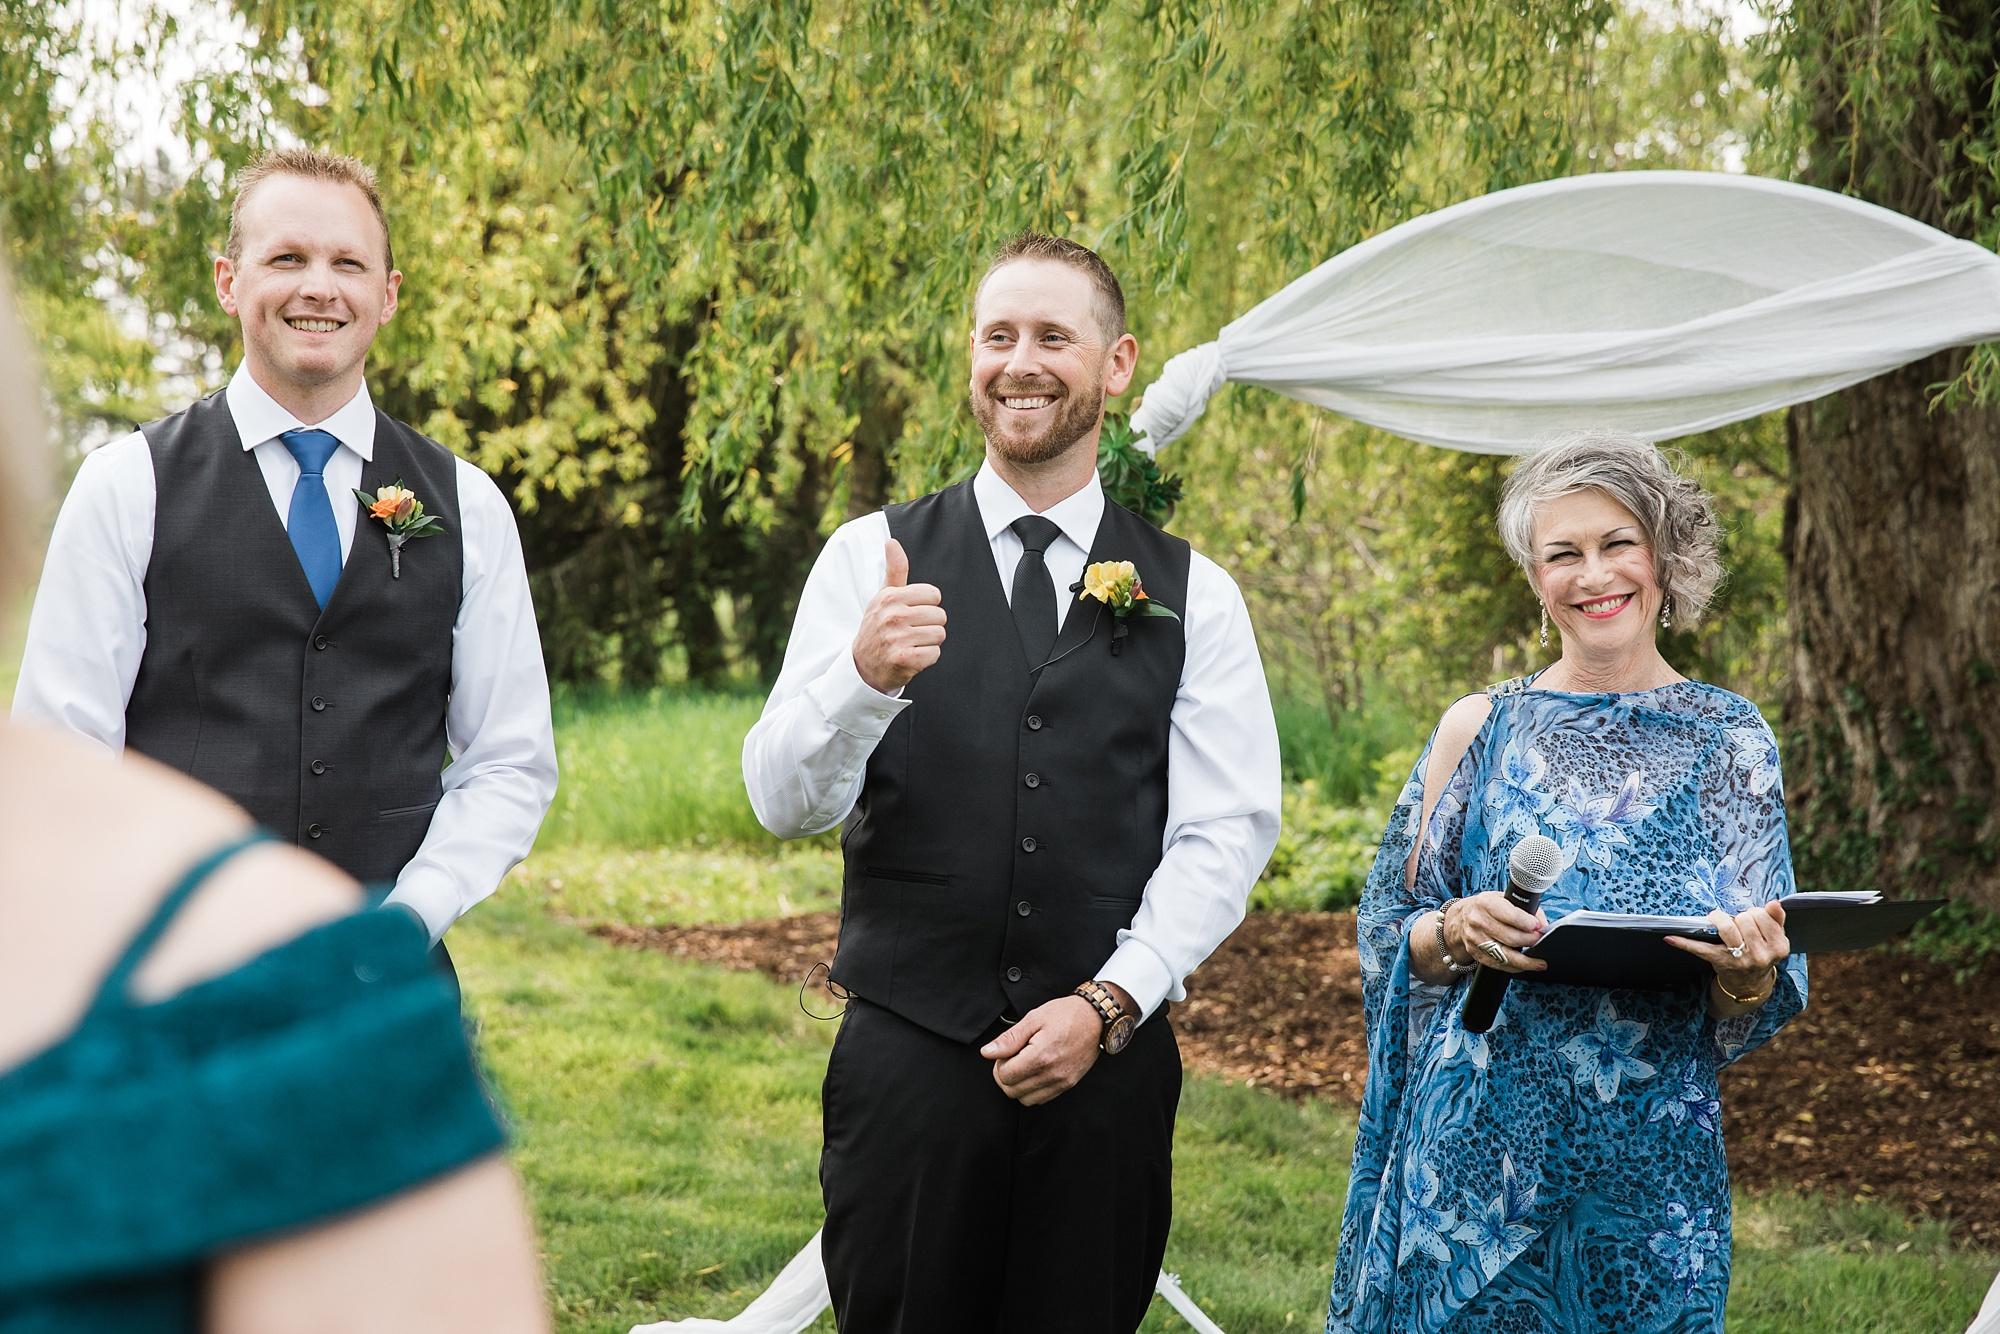 niagarafalls-weddingphotography_0016.jpg